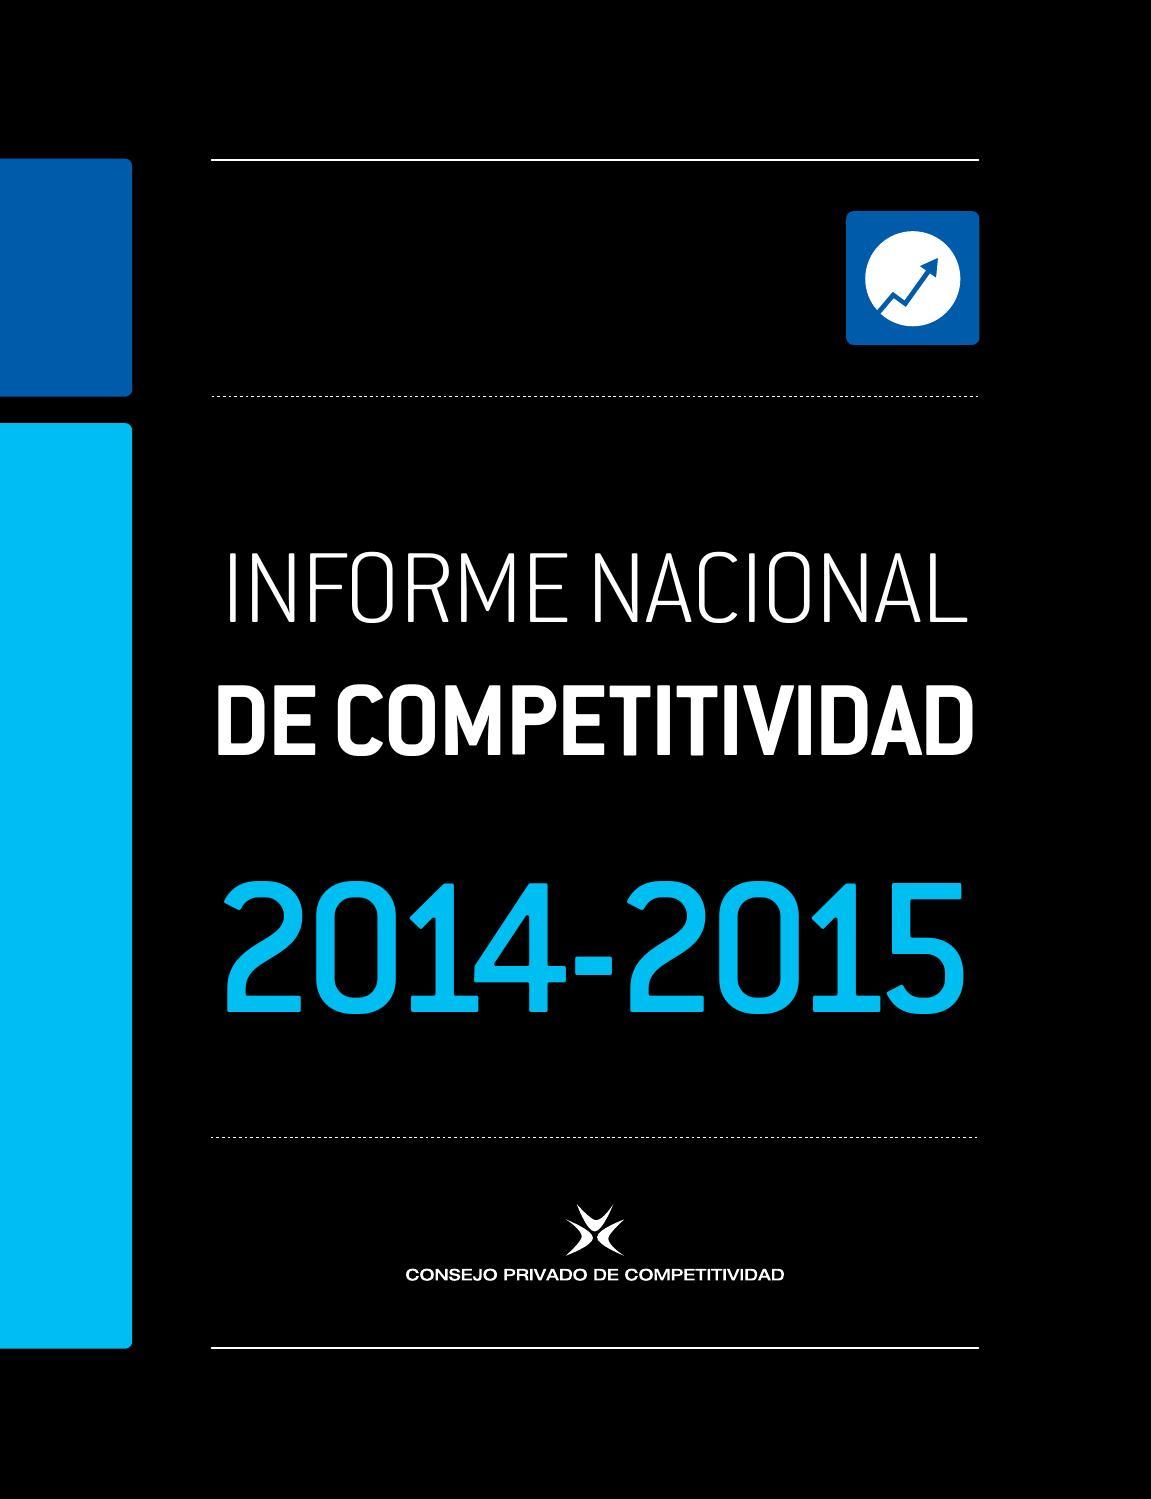 Informe de competitividad 2014-2015 by gihero - issuu